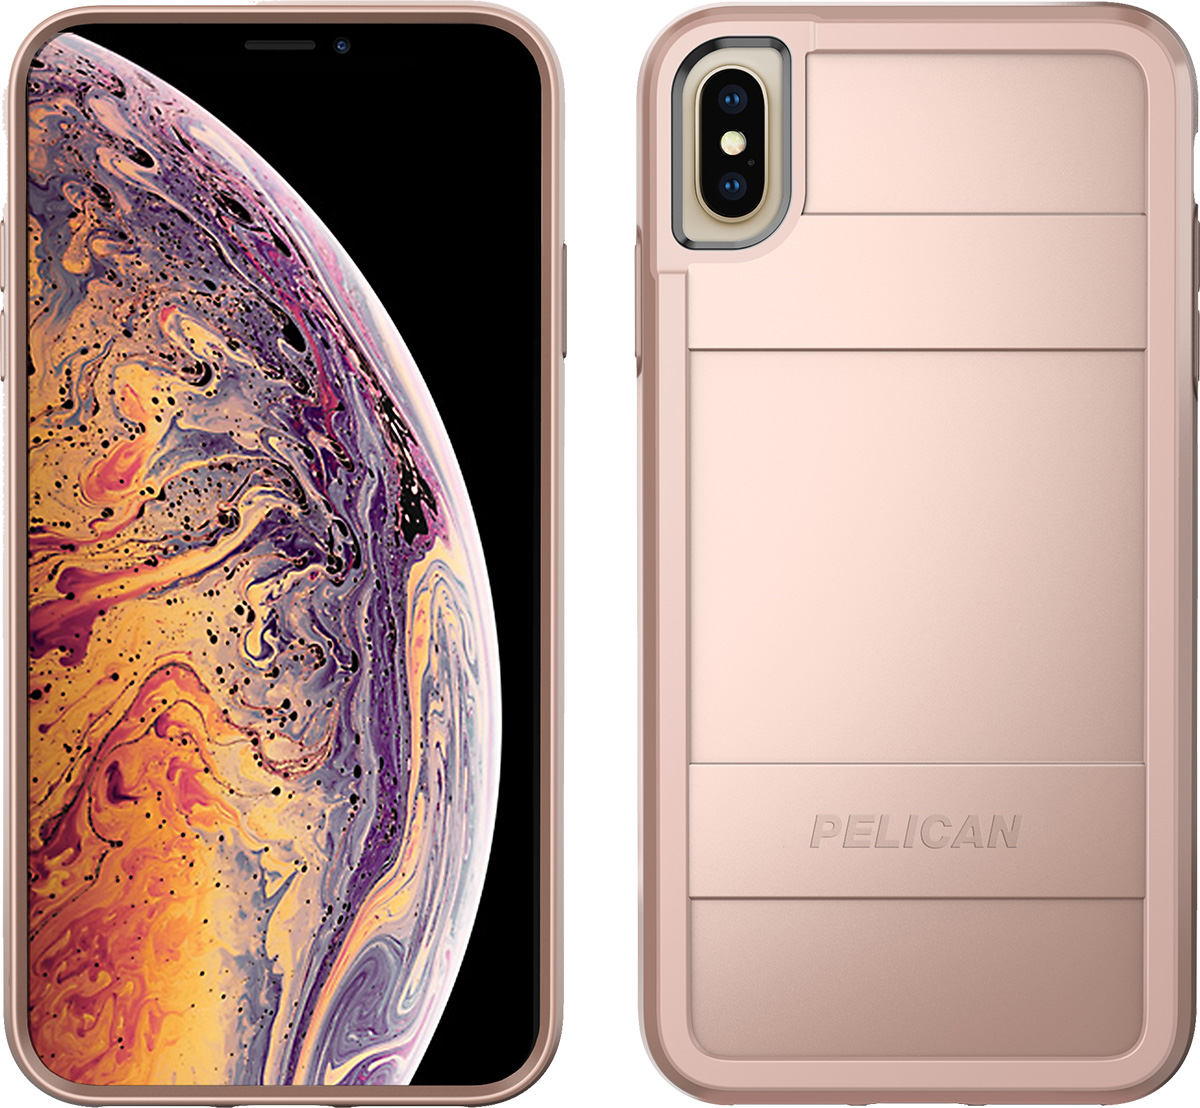 pelican apple iphone c43000 protector rose gold phone case